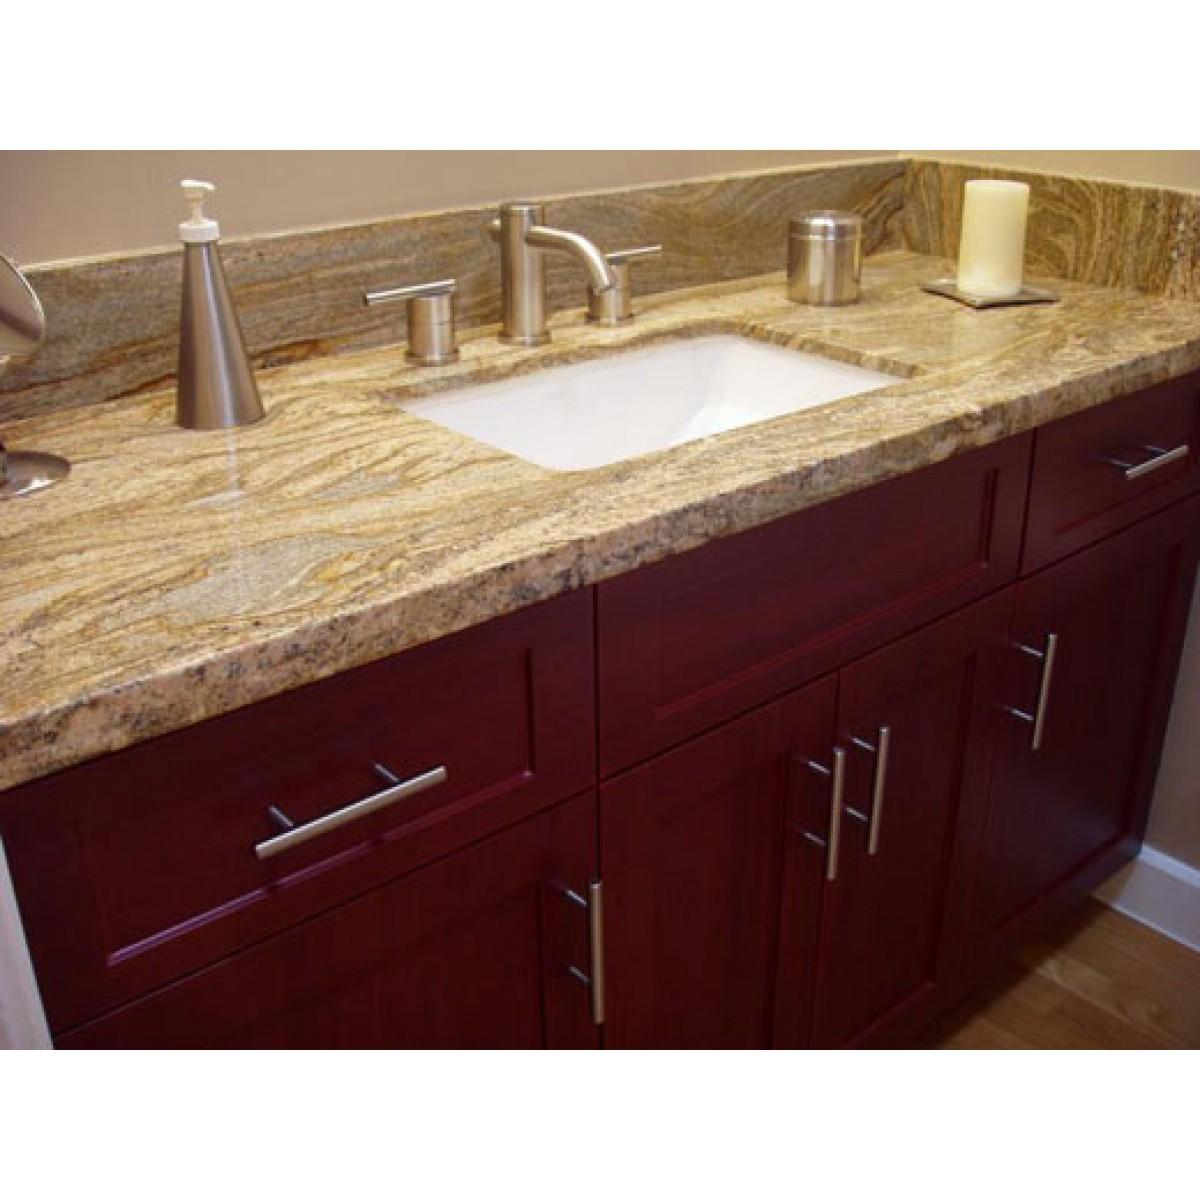 rectangular white porcelain ceramic vanity undermount bathroom vessel sink 20 3 4 x 14 5 8 x 6 3 4 inch